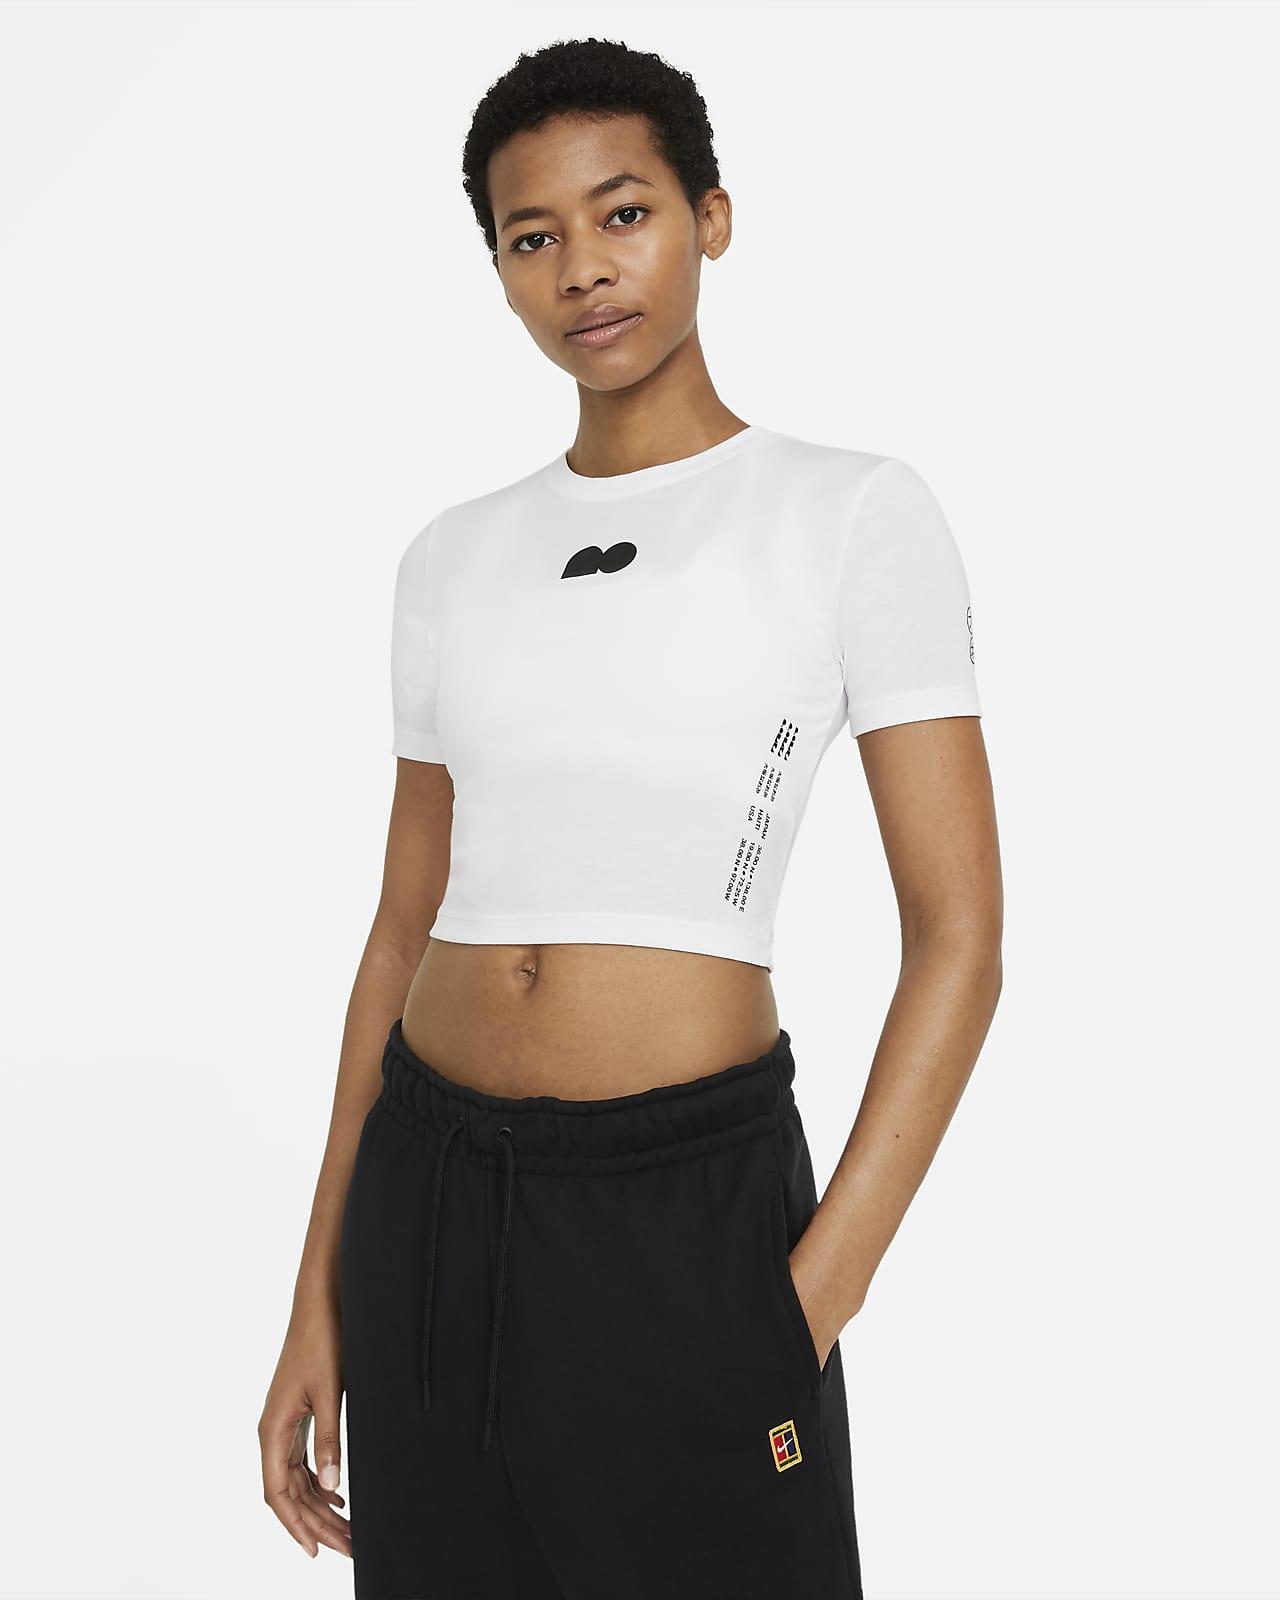 Naomi Osaka kort tennis-T-skjorte